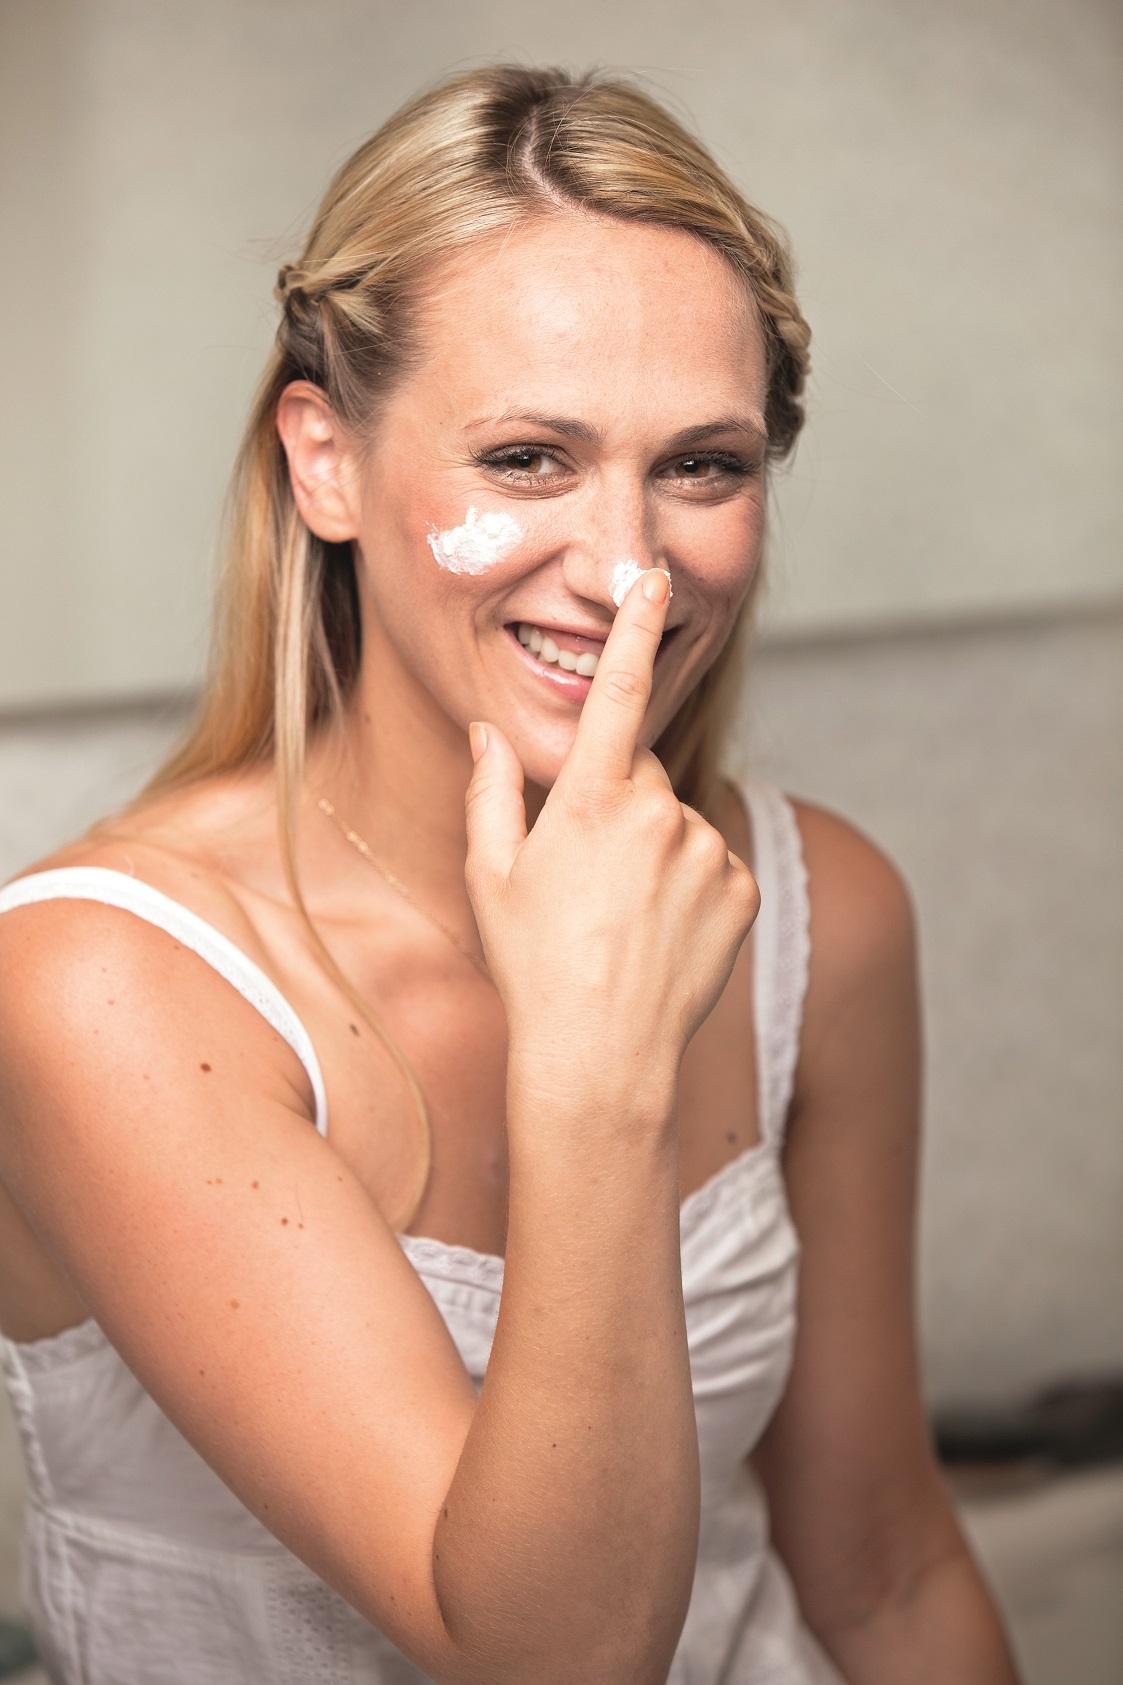 Beauty tema Kucni Spa. Model Neda Parmac. Vizazist Zana Kozul. Stilist Iva Gradiser.  Snimljeno u Shoowroom Credo centar.  Fotograf MAtej Dokic 040712 GLORIA